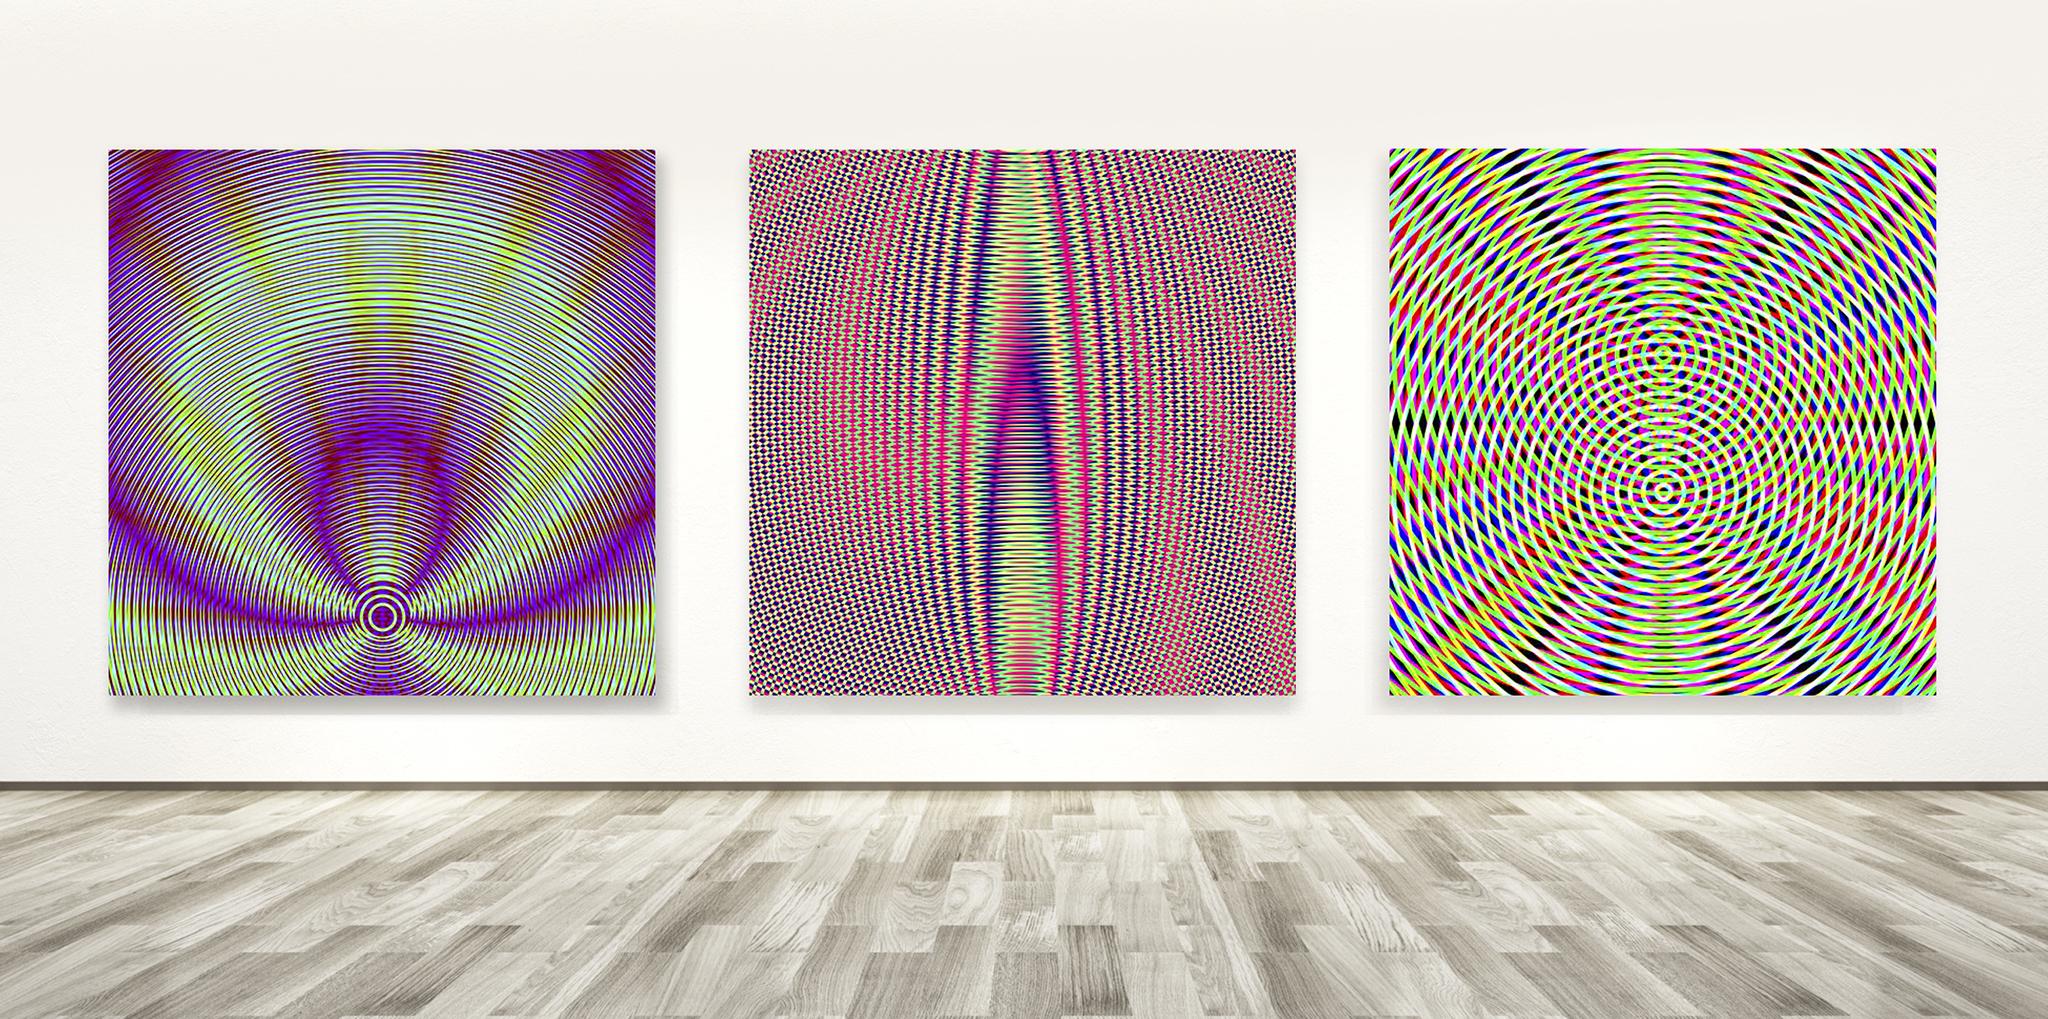 Geometric-Resonance-Vibrant-Optical-Illusions-Wood-Prints.jpg